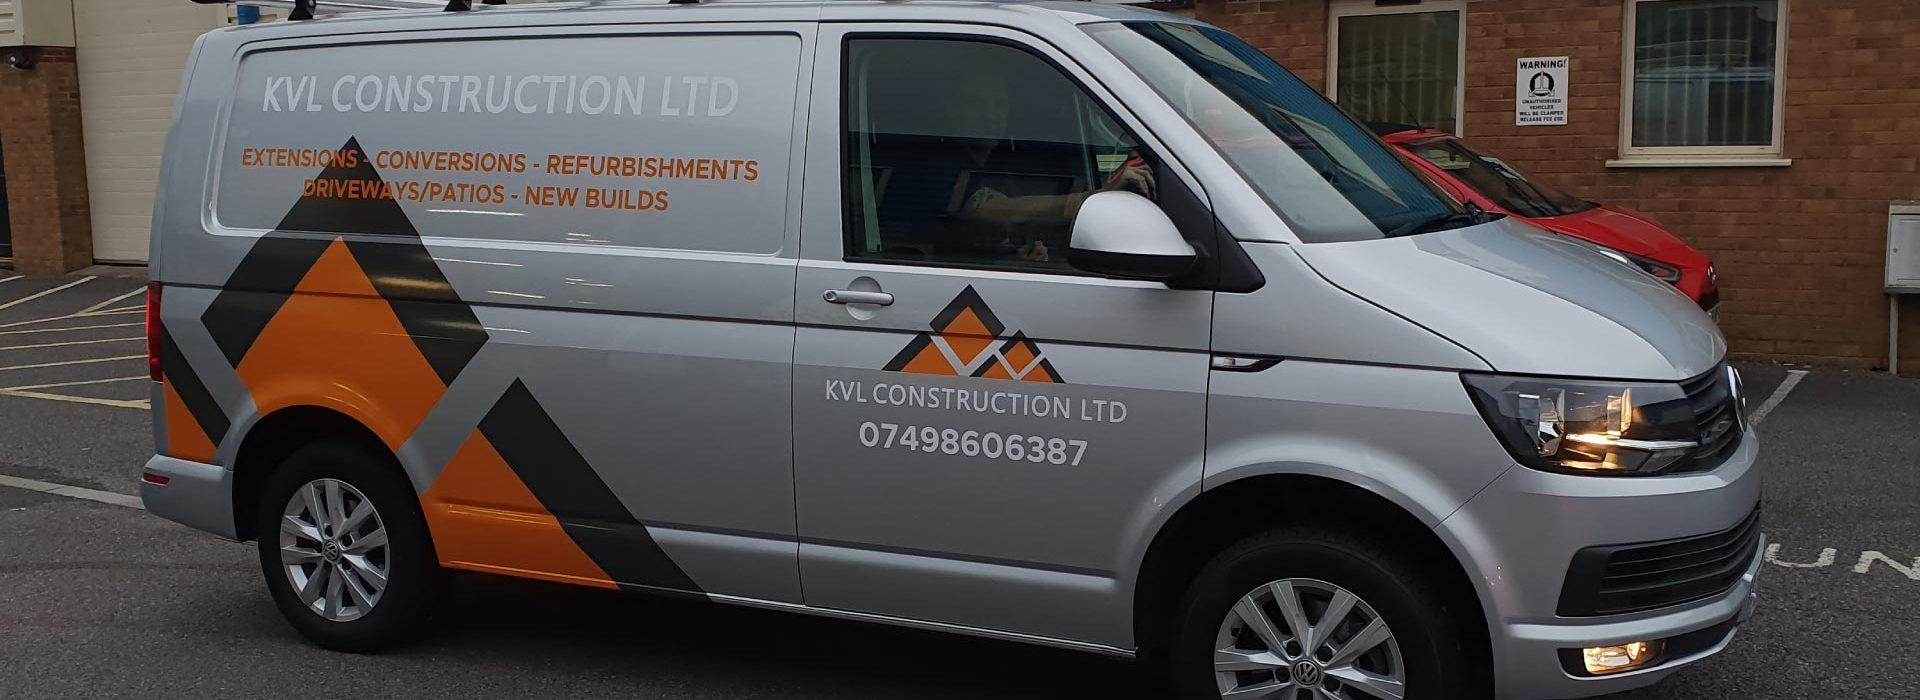 KVL Construction Ltd Van Wrap - Insignia Signs Portfolio Poole Bournemouth